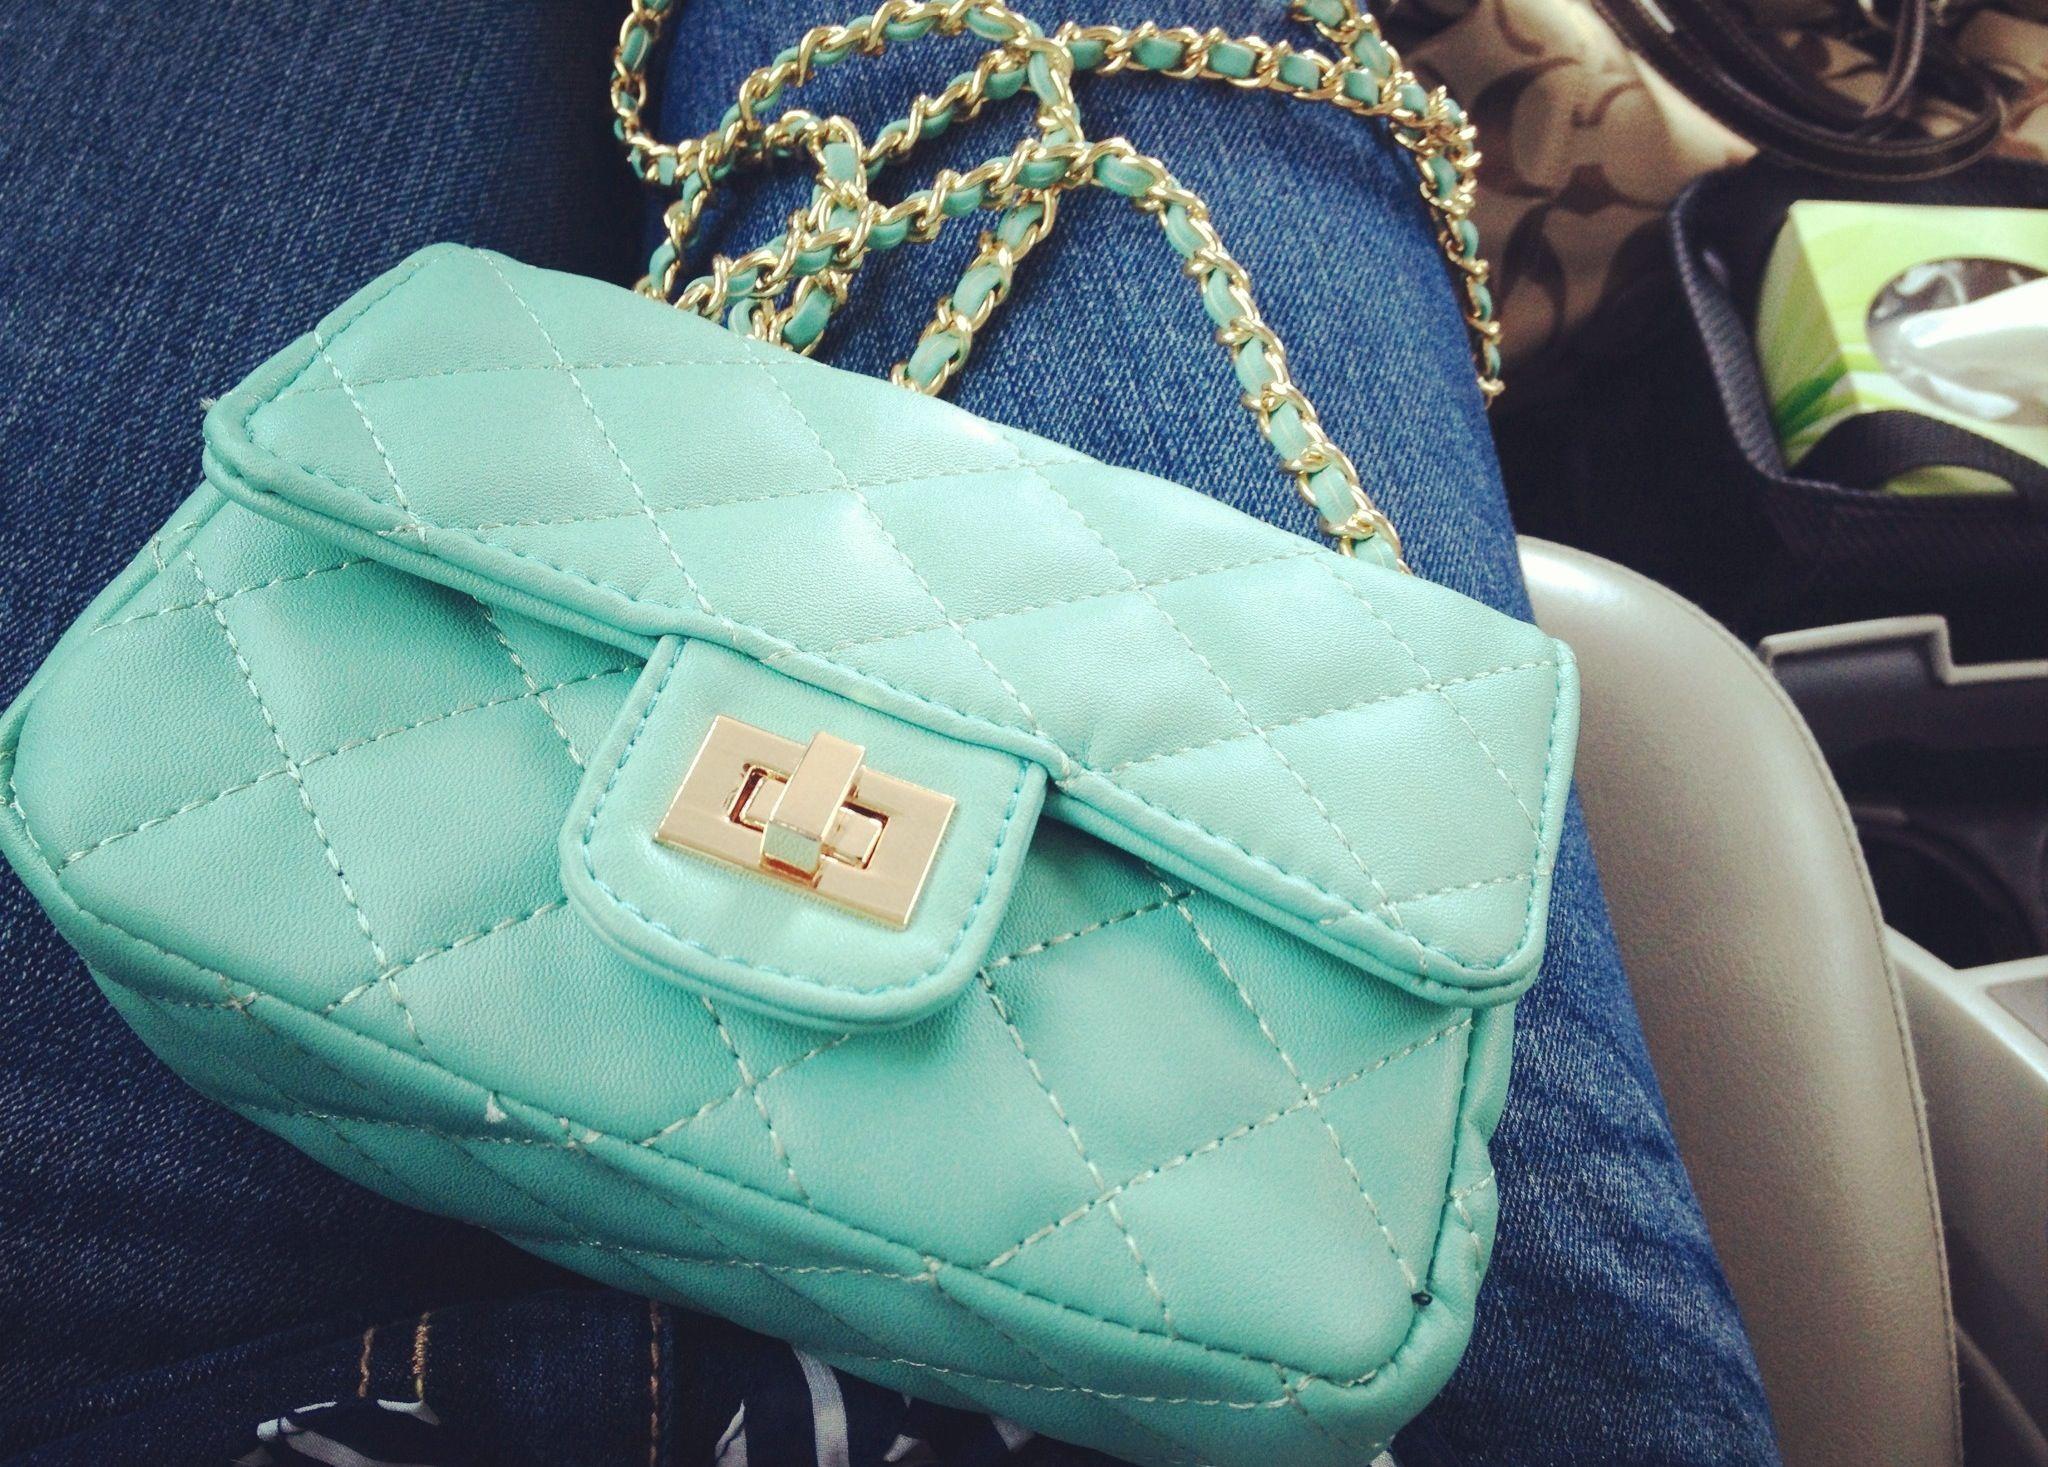 My new purse #mint #purse #chain